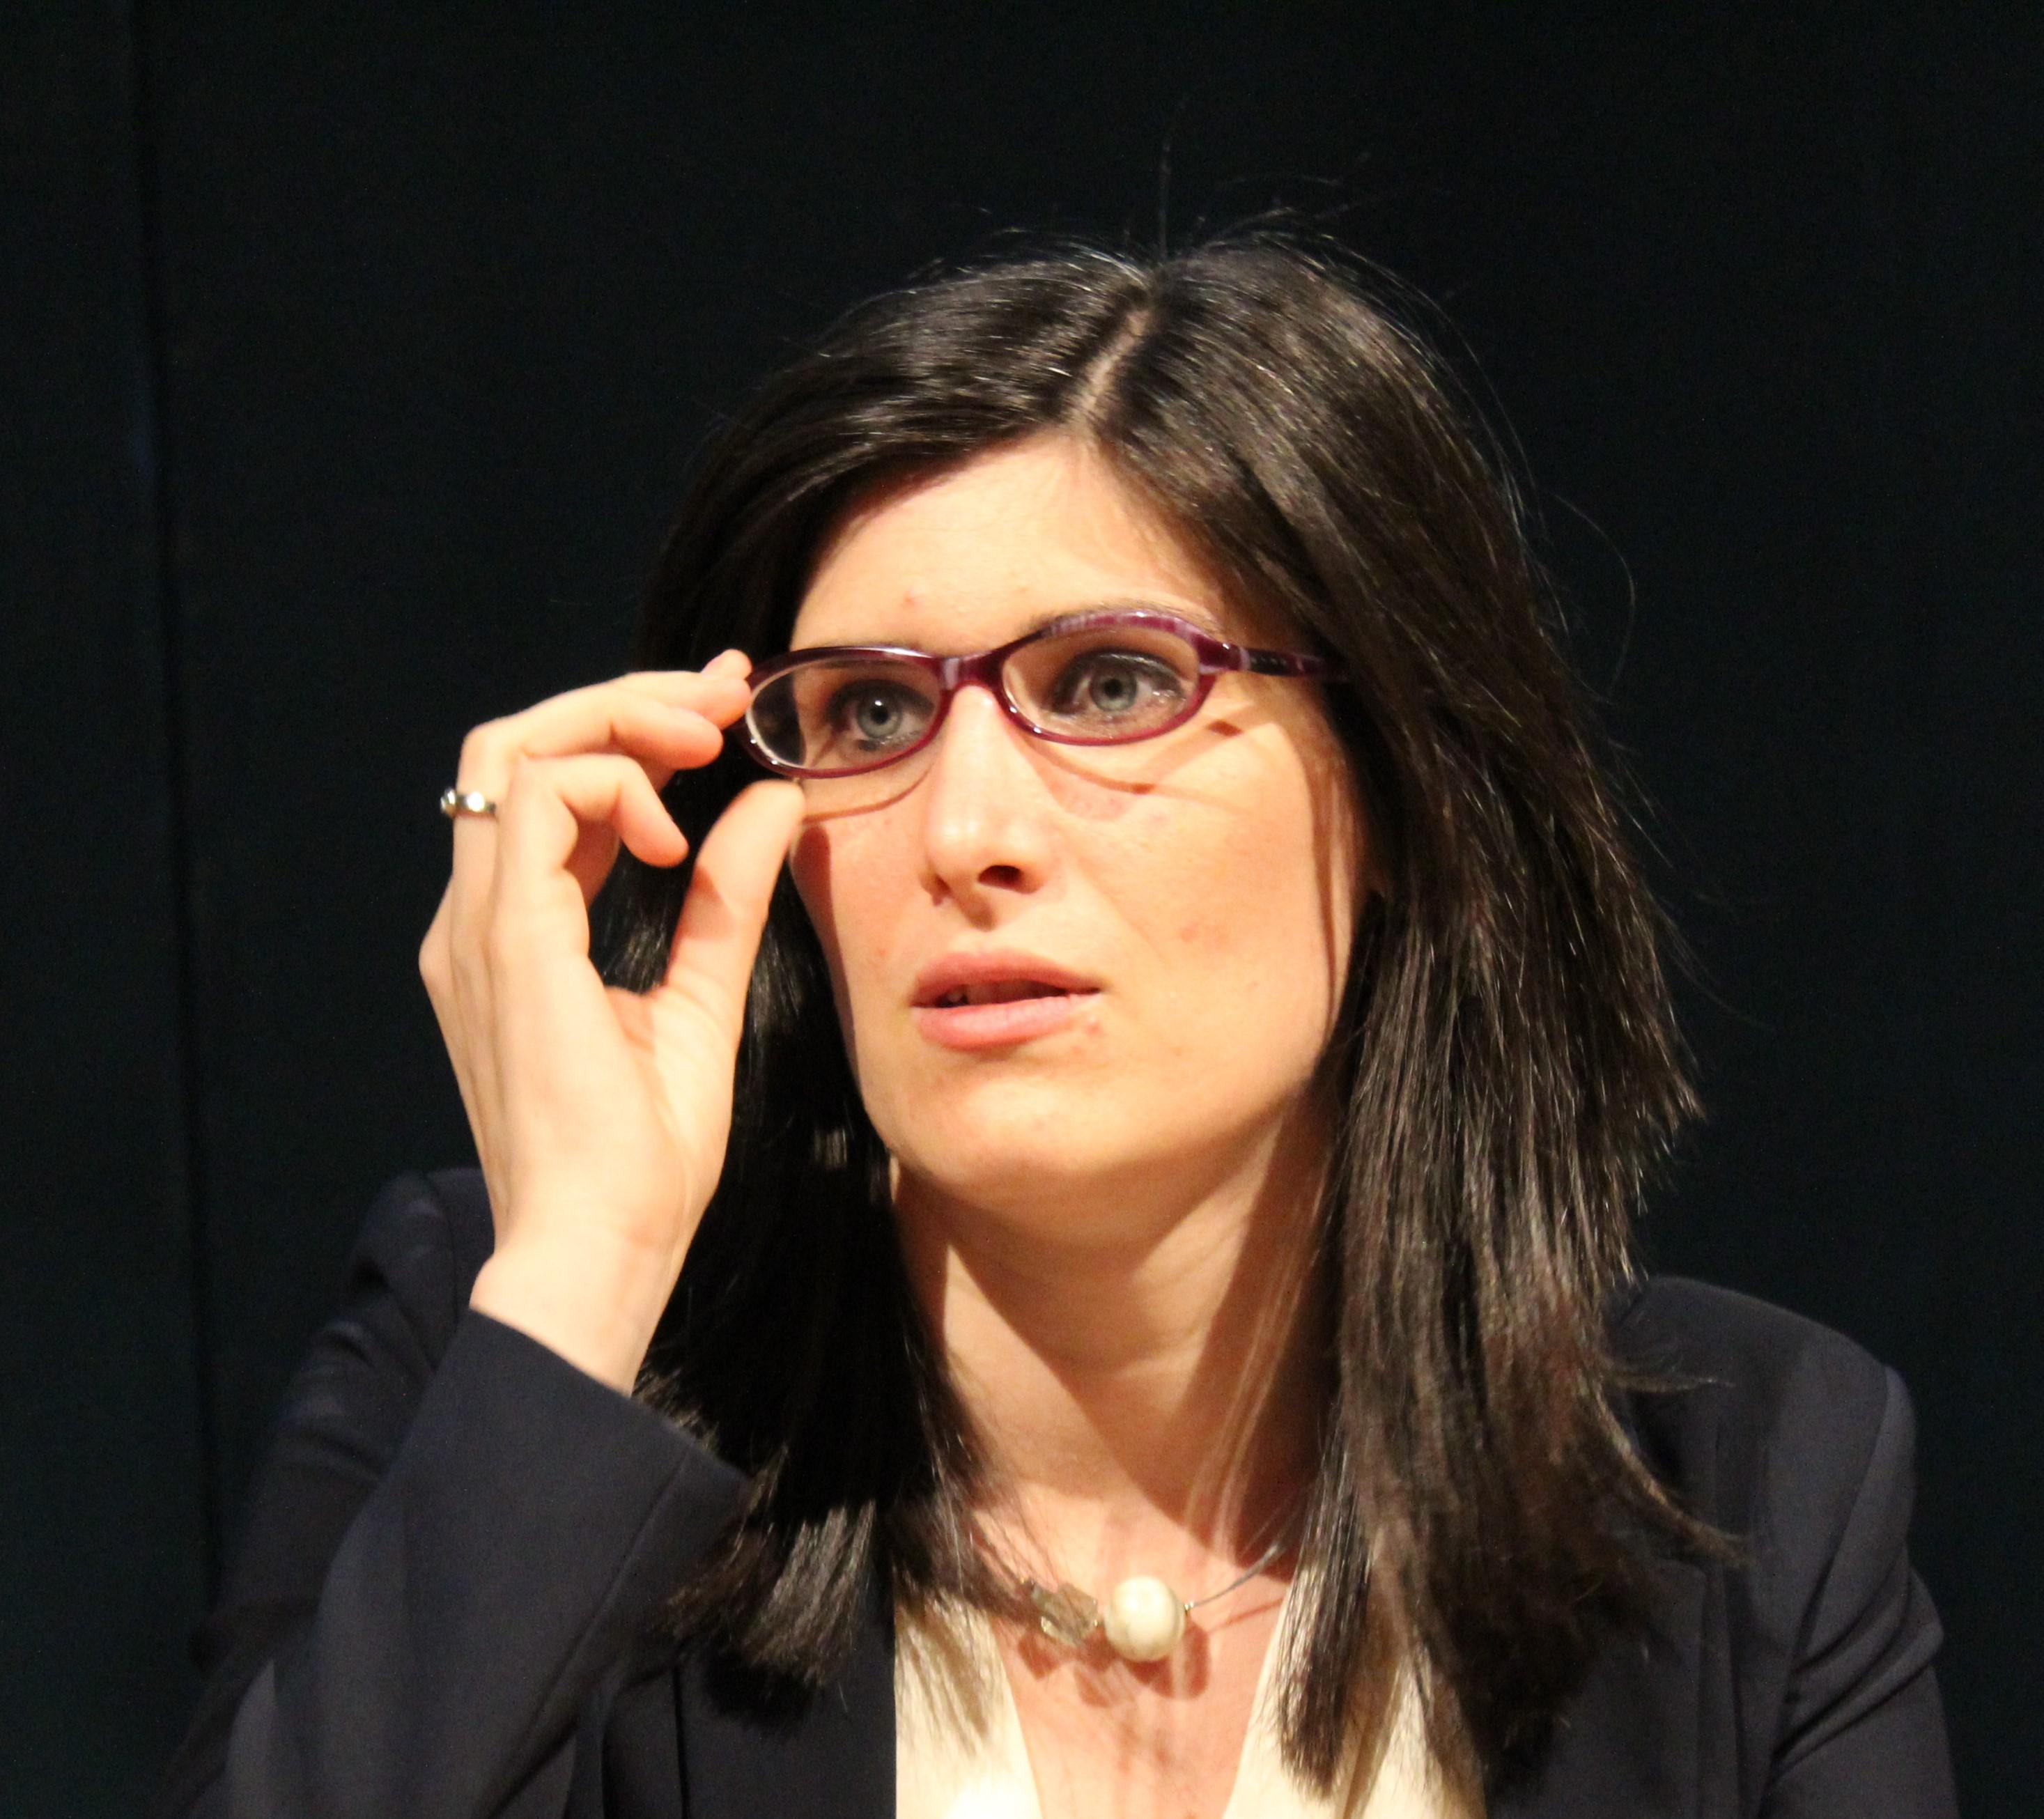 Chiara_Appendino Torino